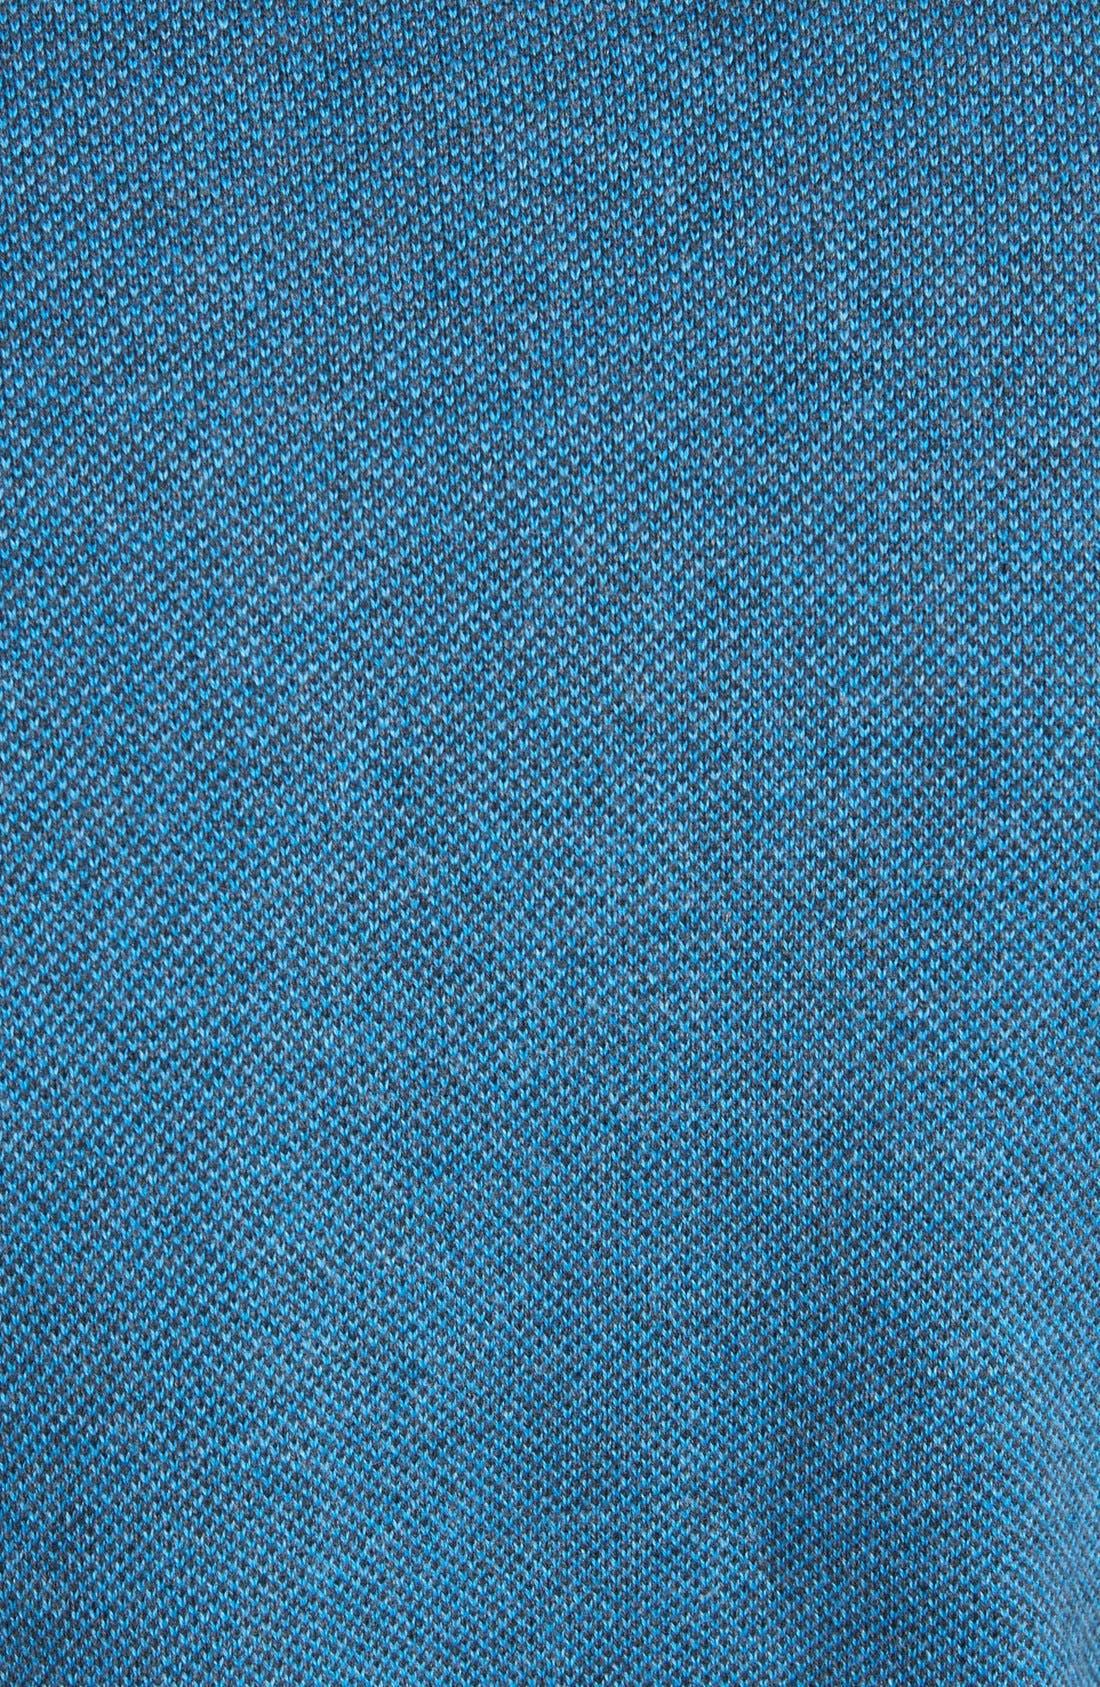 Alternate Image 3  - Cutter & Buck 'Haven' Half Zip Bird's Eye Sweater (Big & Tall)